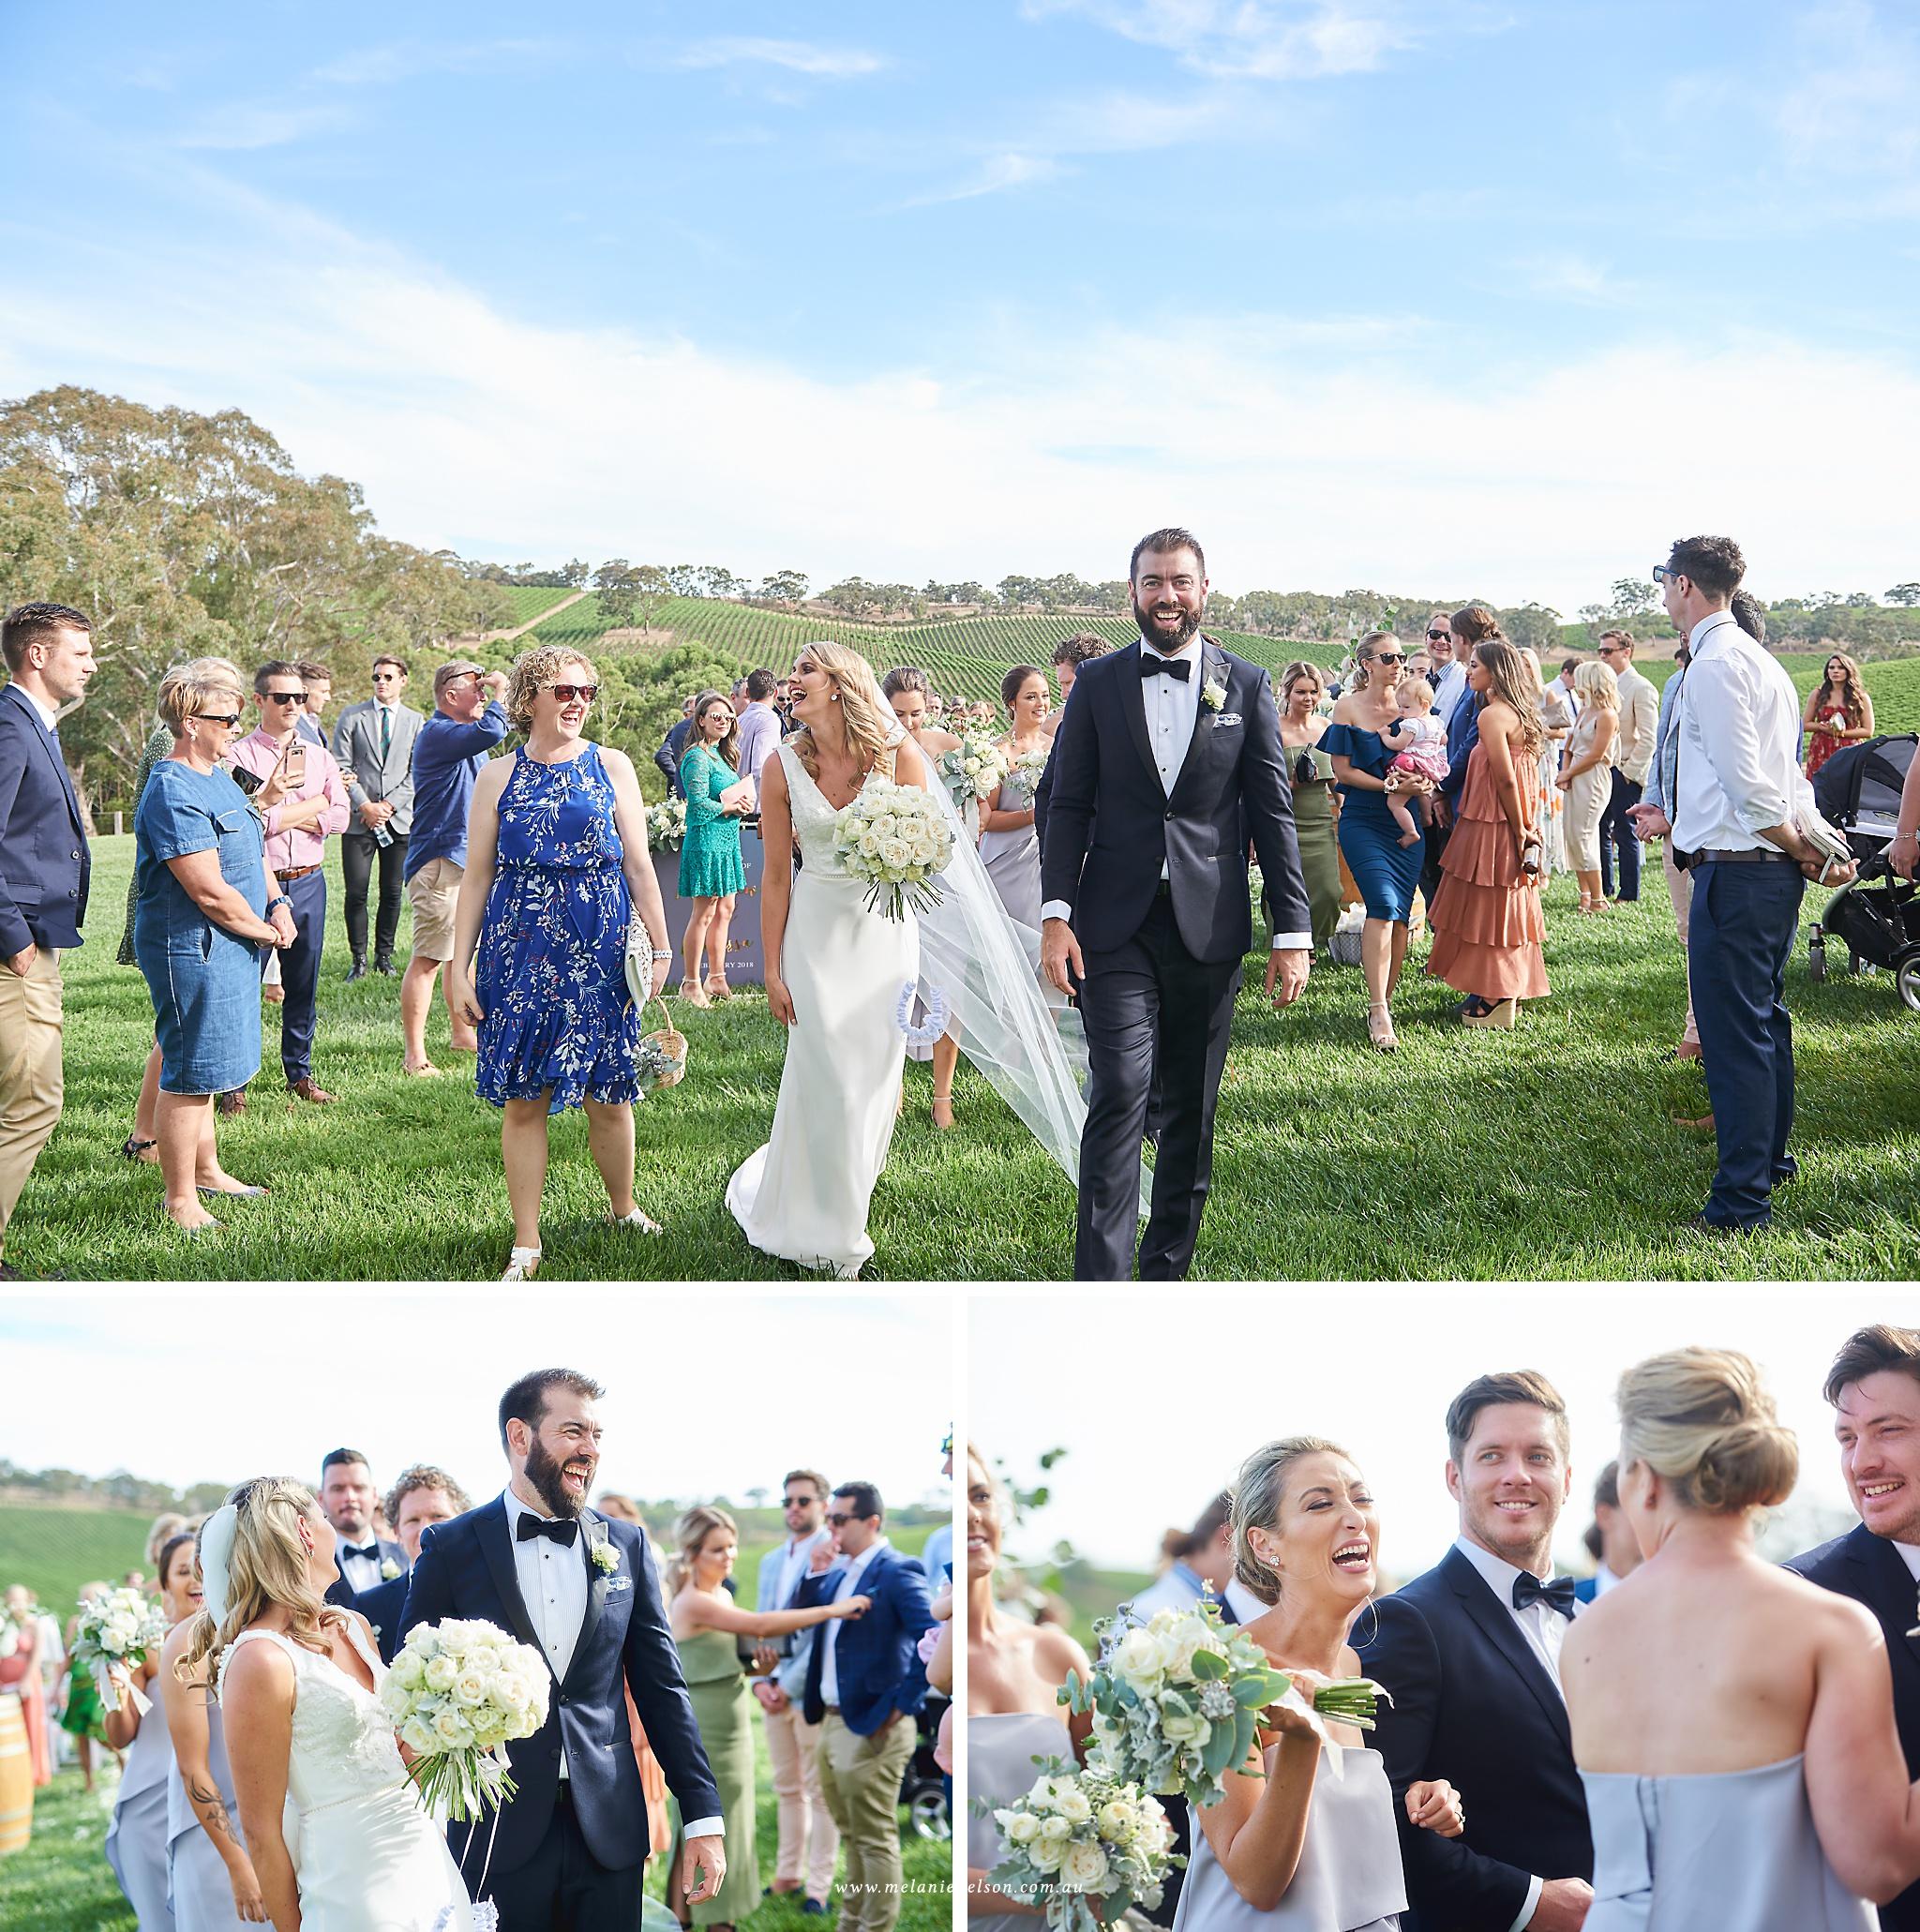 longview_vineyard_wedding_0050.jpg